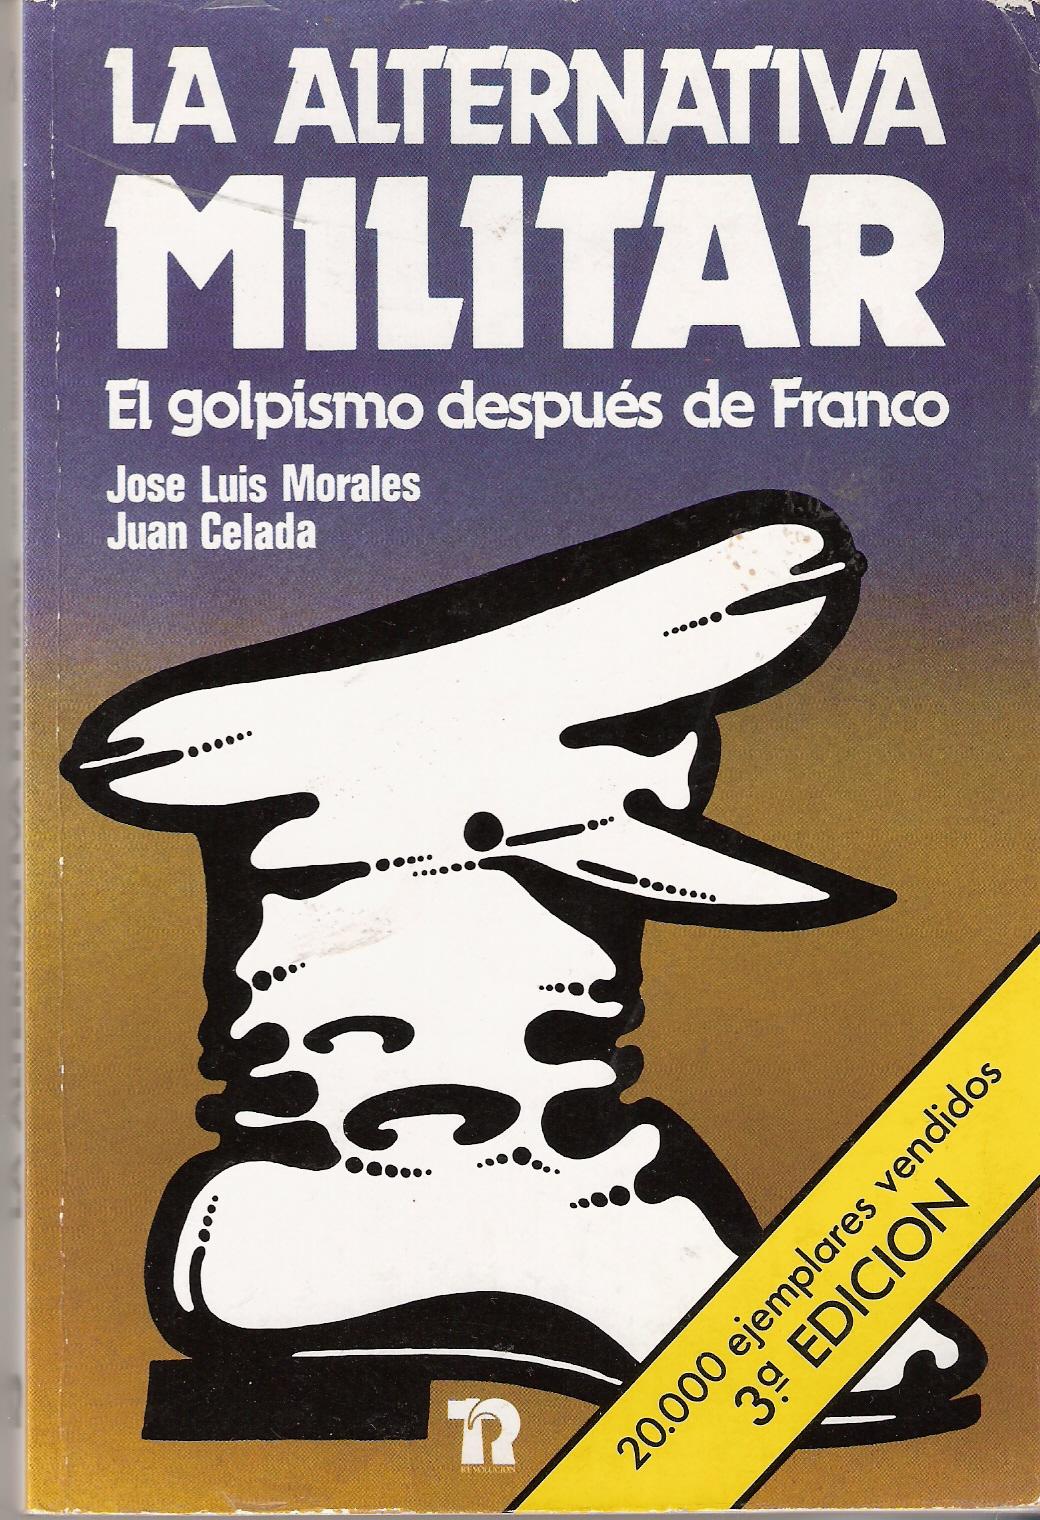 La alternativa militar